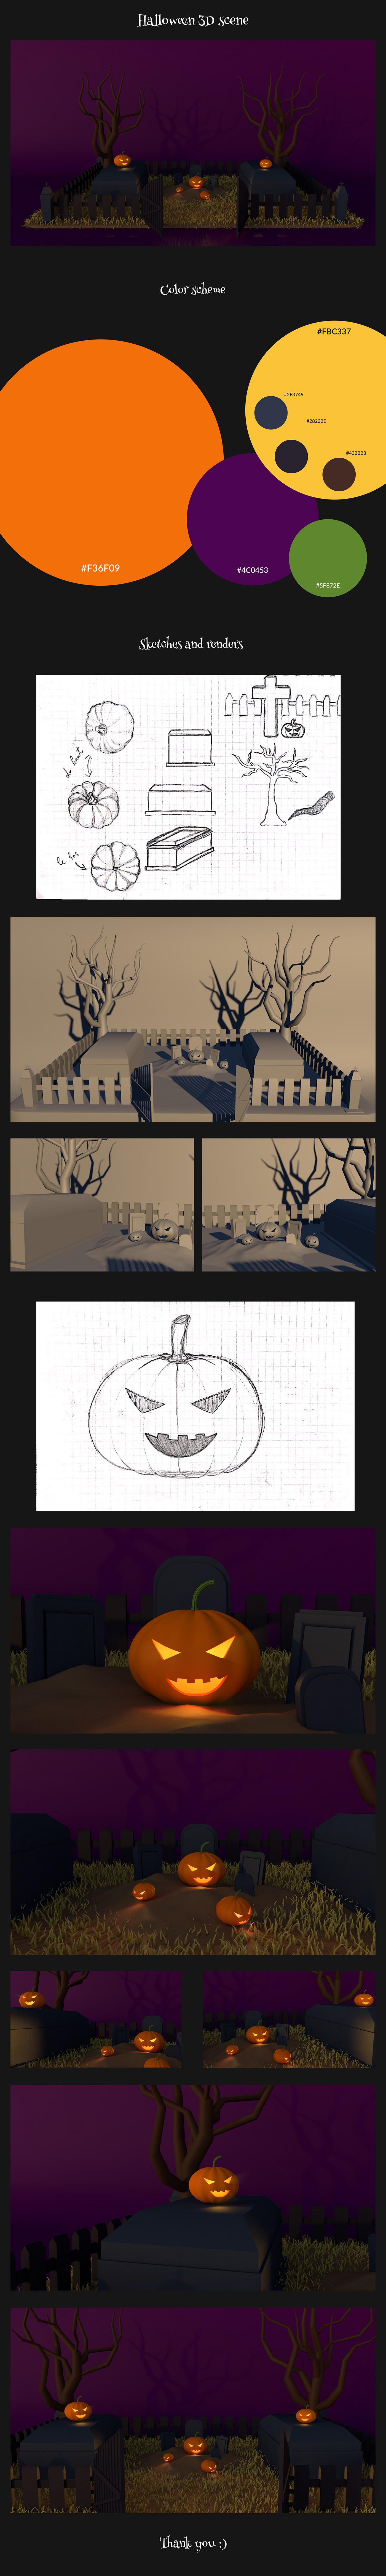 3D cemetery cinema4d Halloween ILLUSTRATION  pumpkin sketches spooky tree